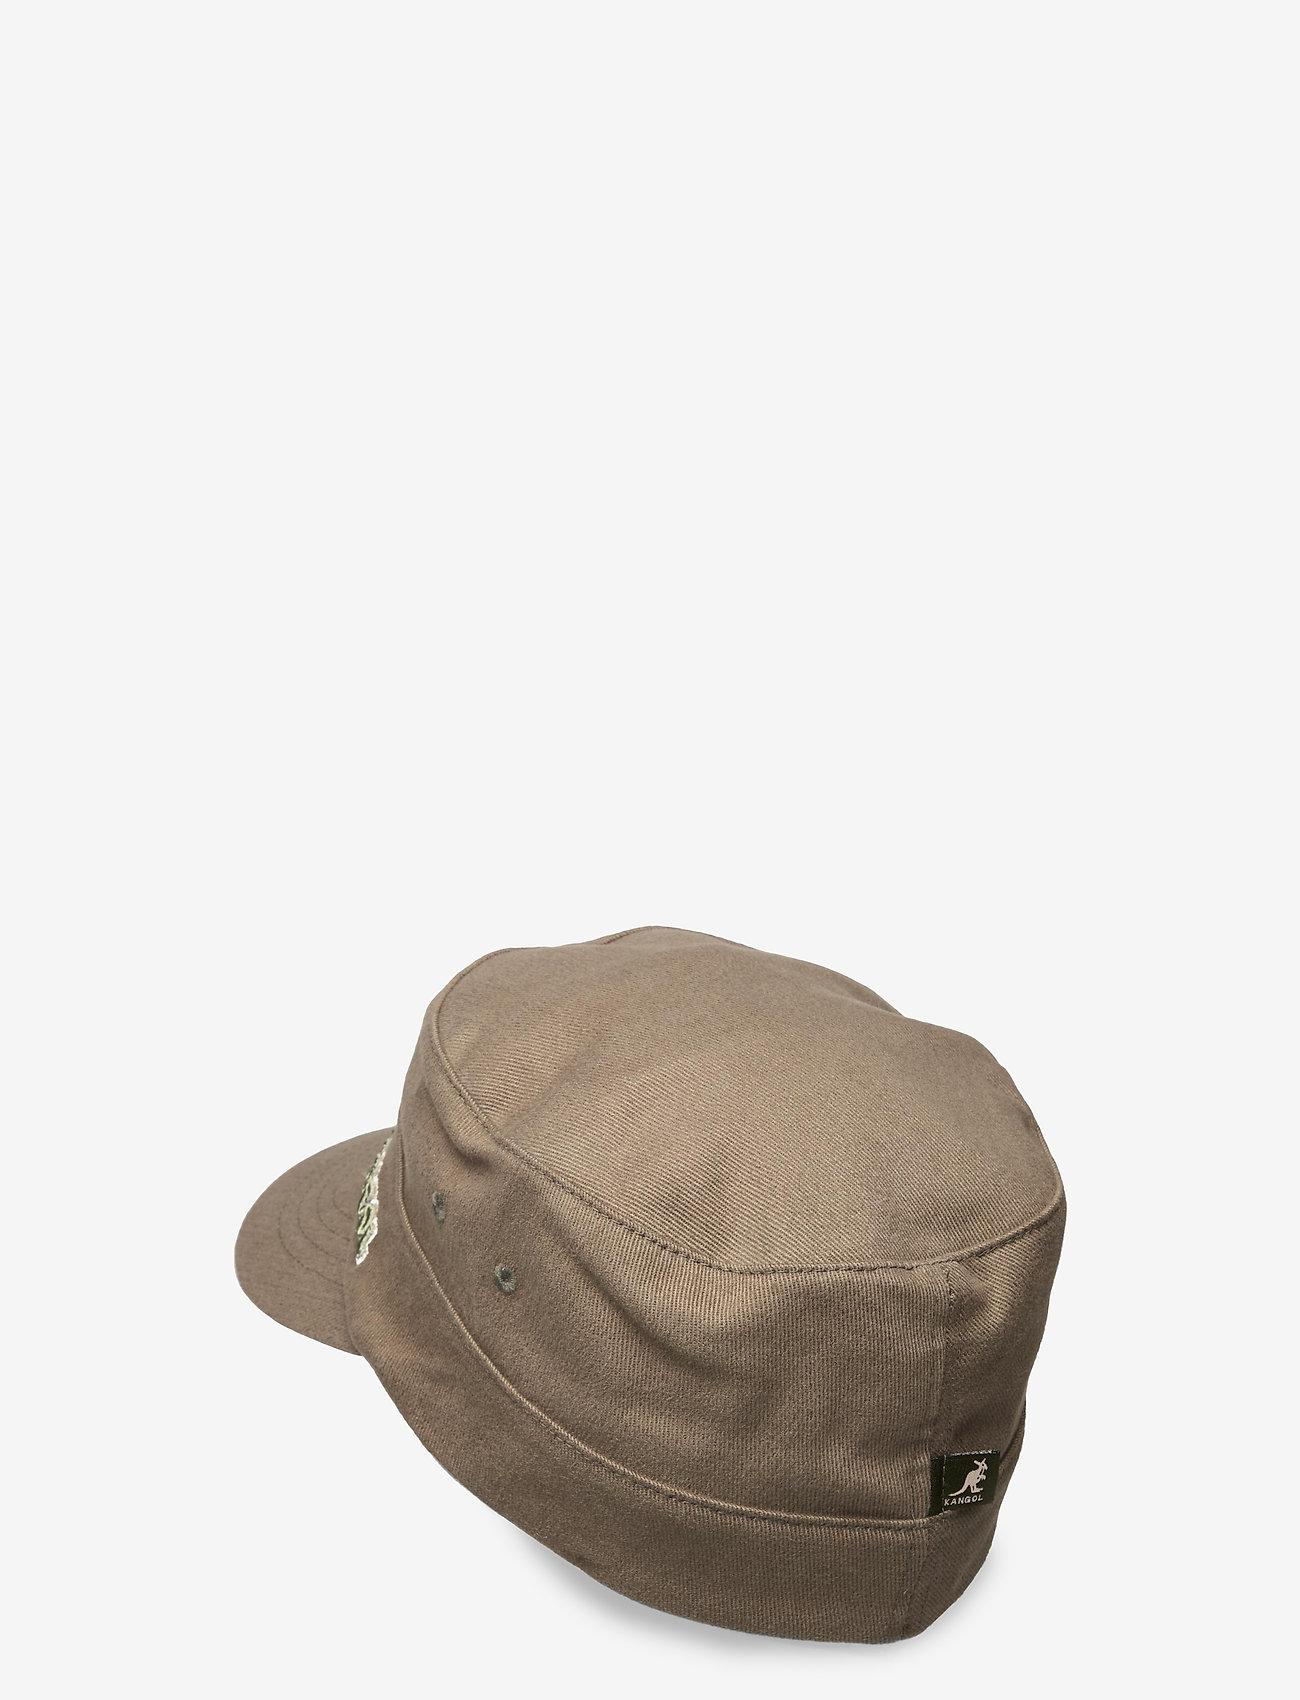 Kangol - KG COTTON TWILL ARMY CAP - kasketter - green - 1